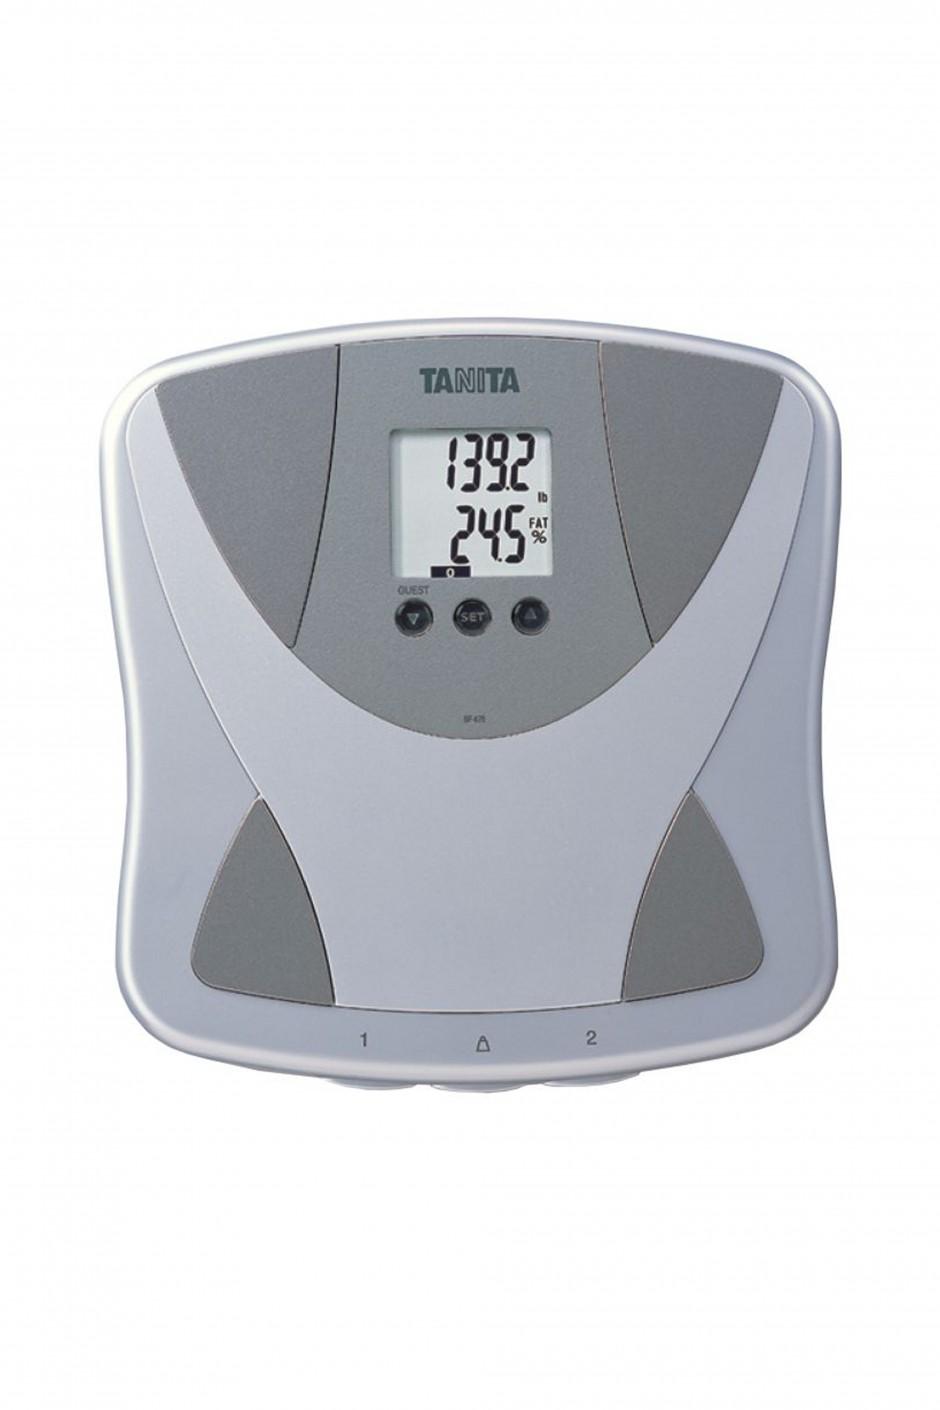 Eatsmart Precision Digital Bathroom Scale | Calibrate Digital Scale | Best Rated Bathroom Scales